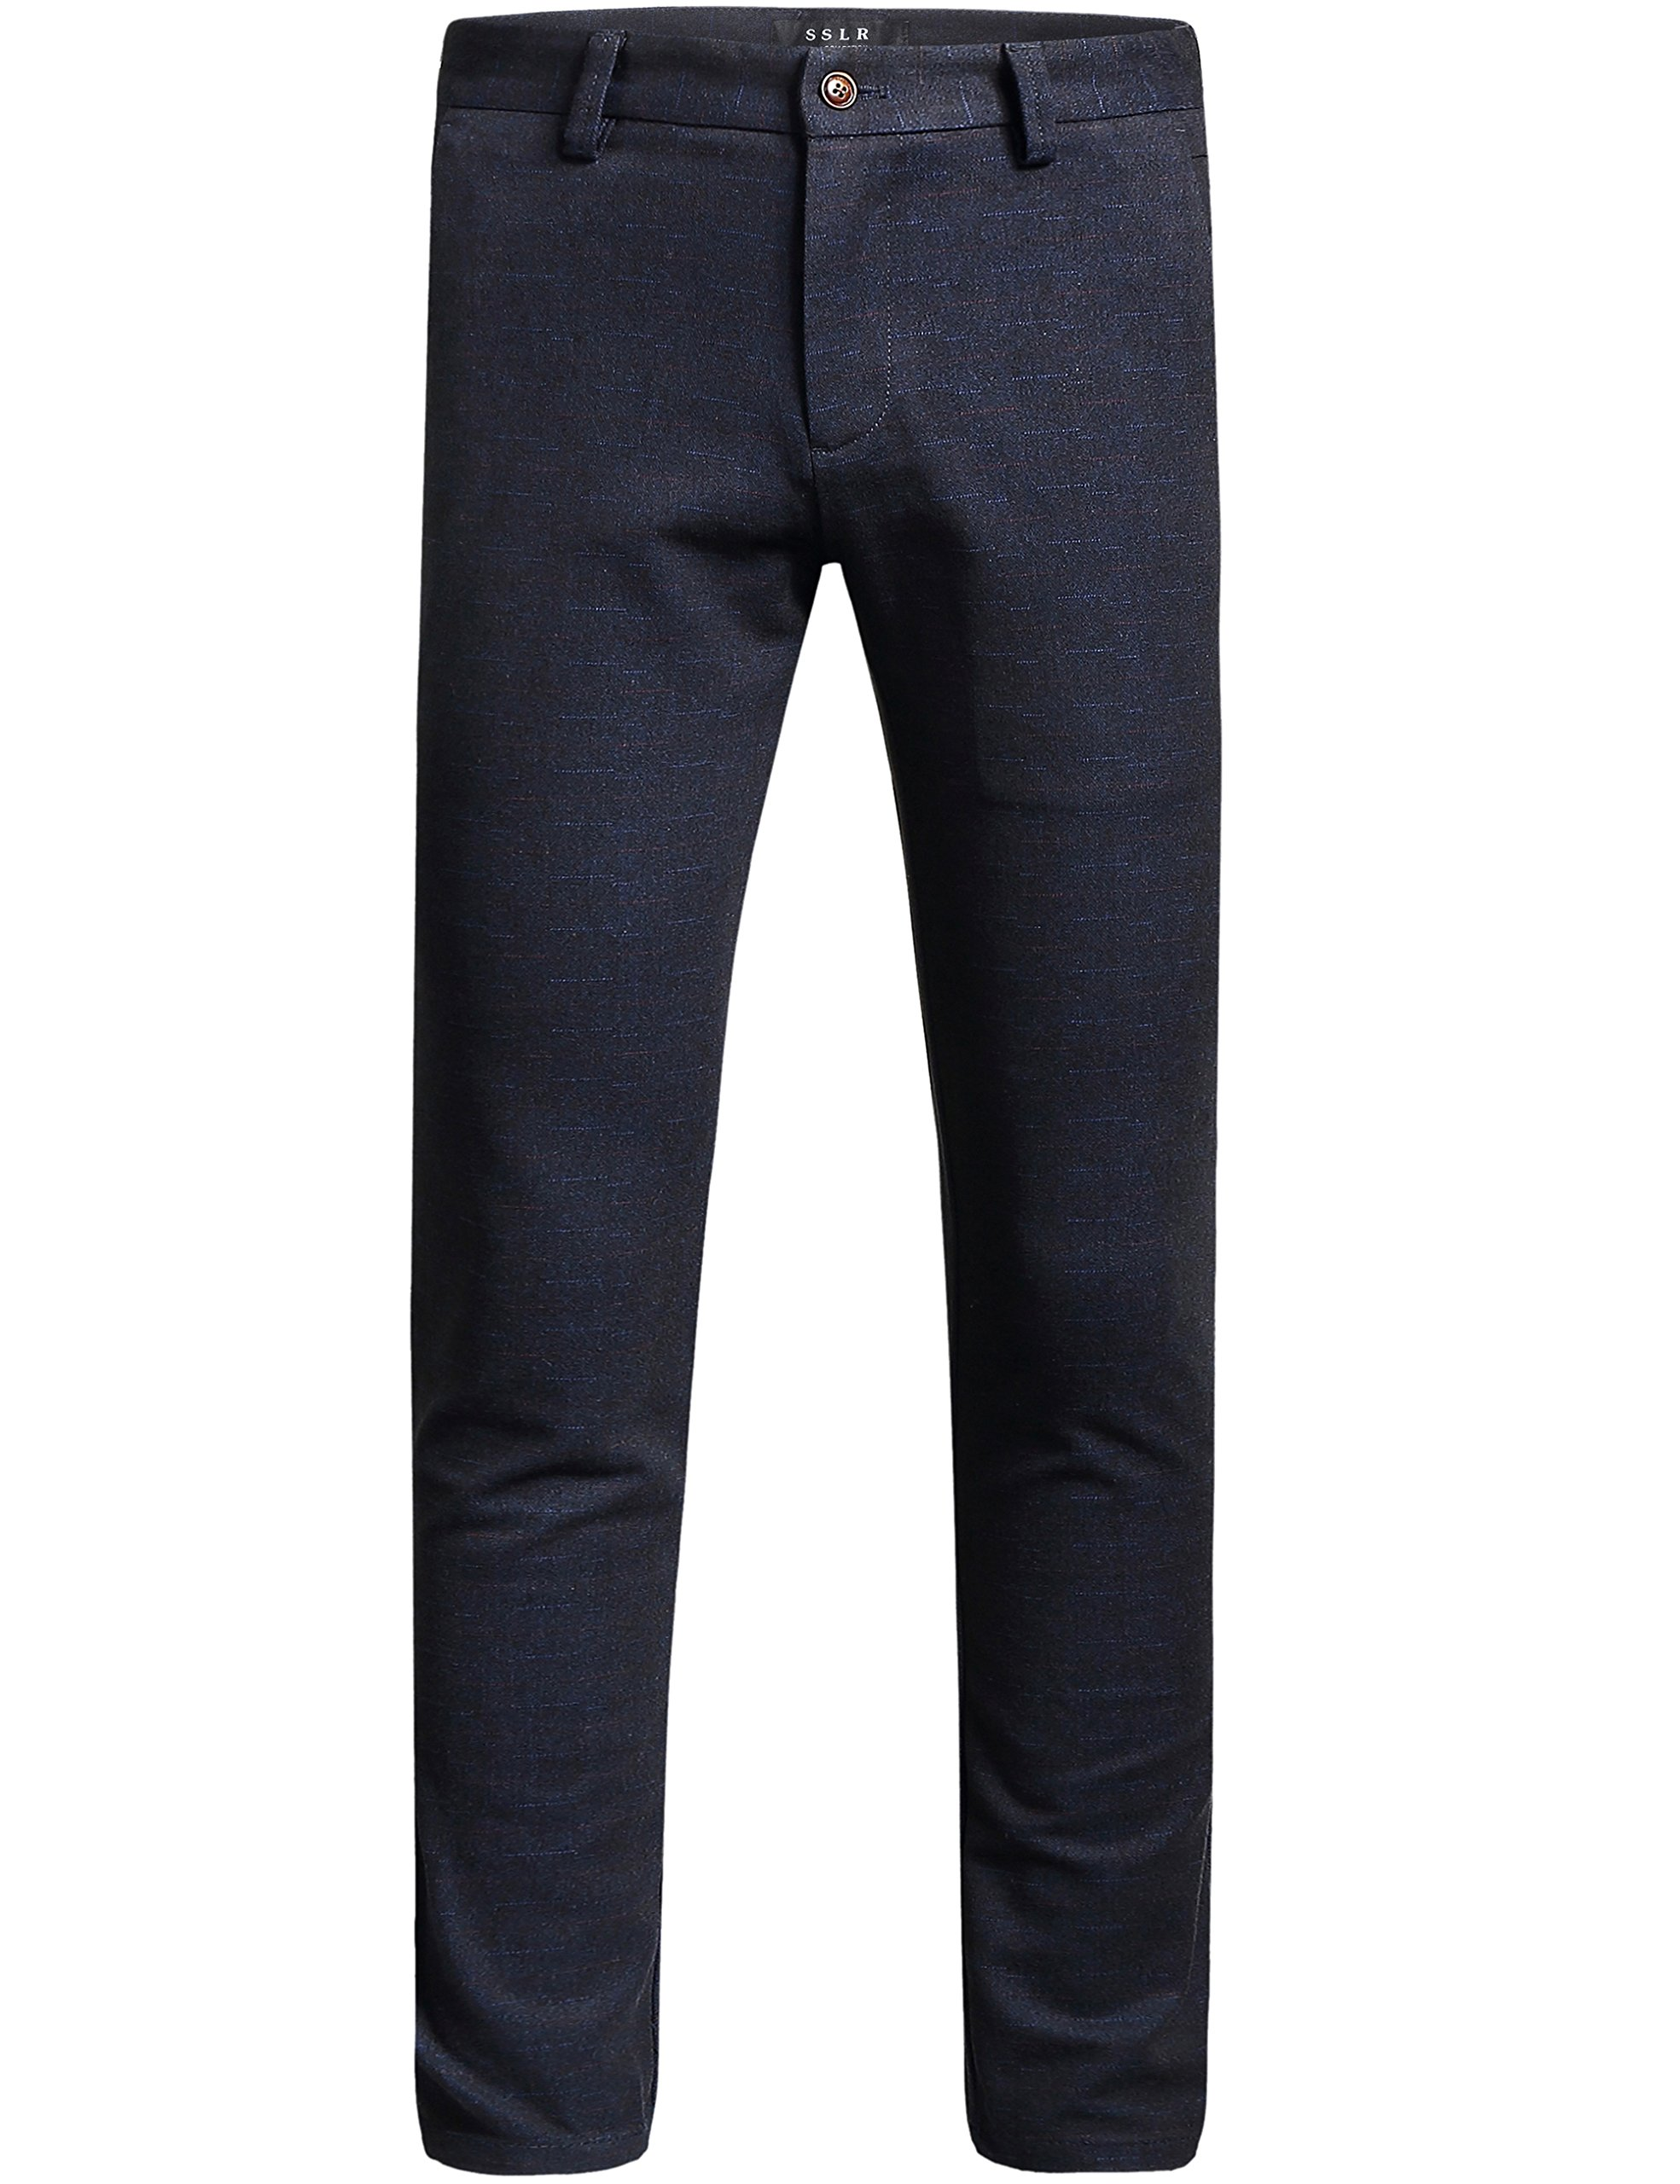 SSLR Men's Slim Fit Straight Leg Business Casual Pants (36, Black Blue)